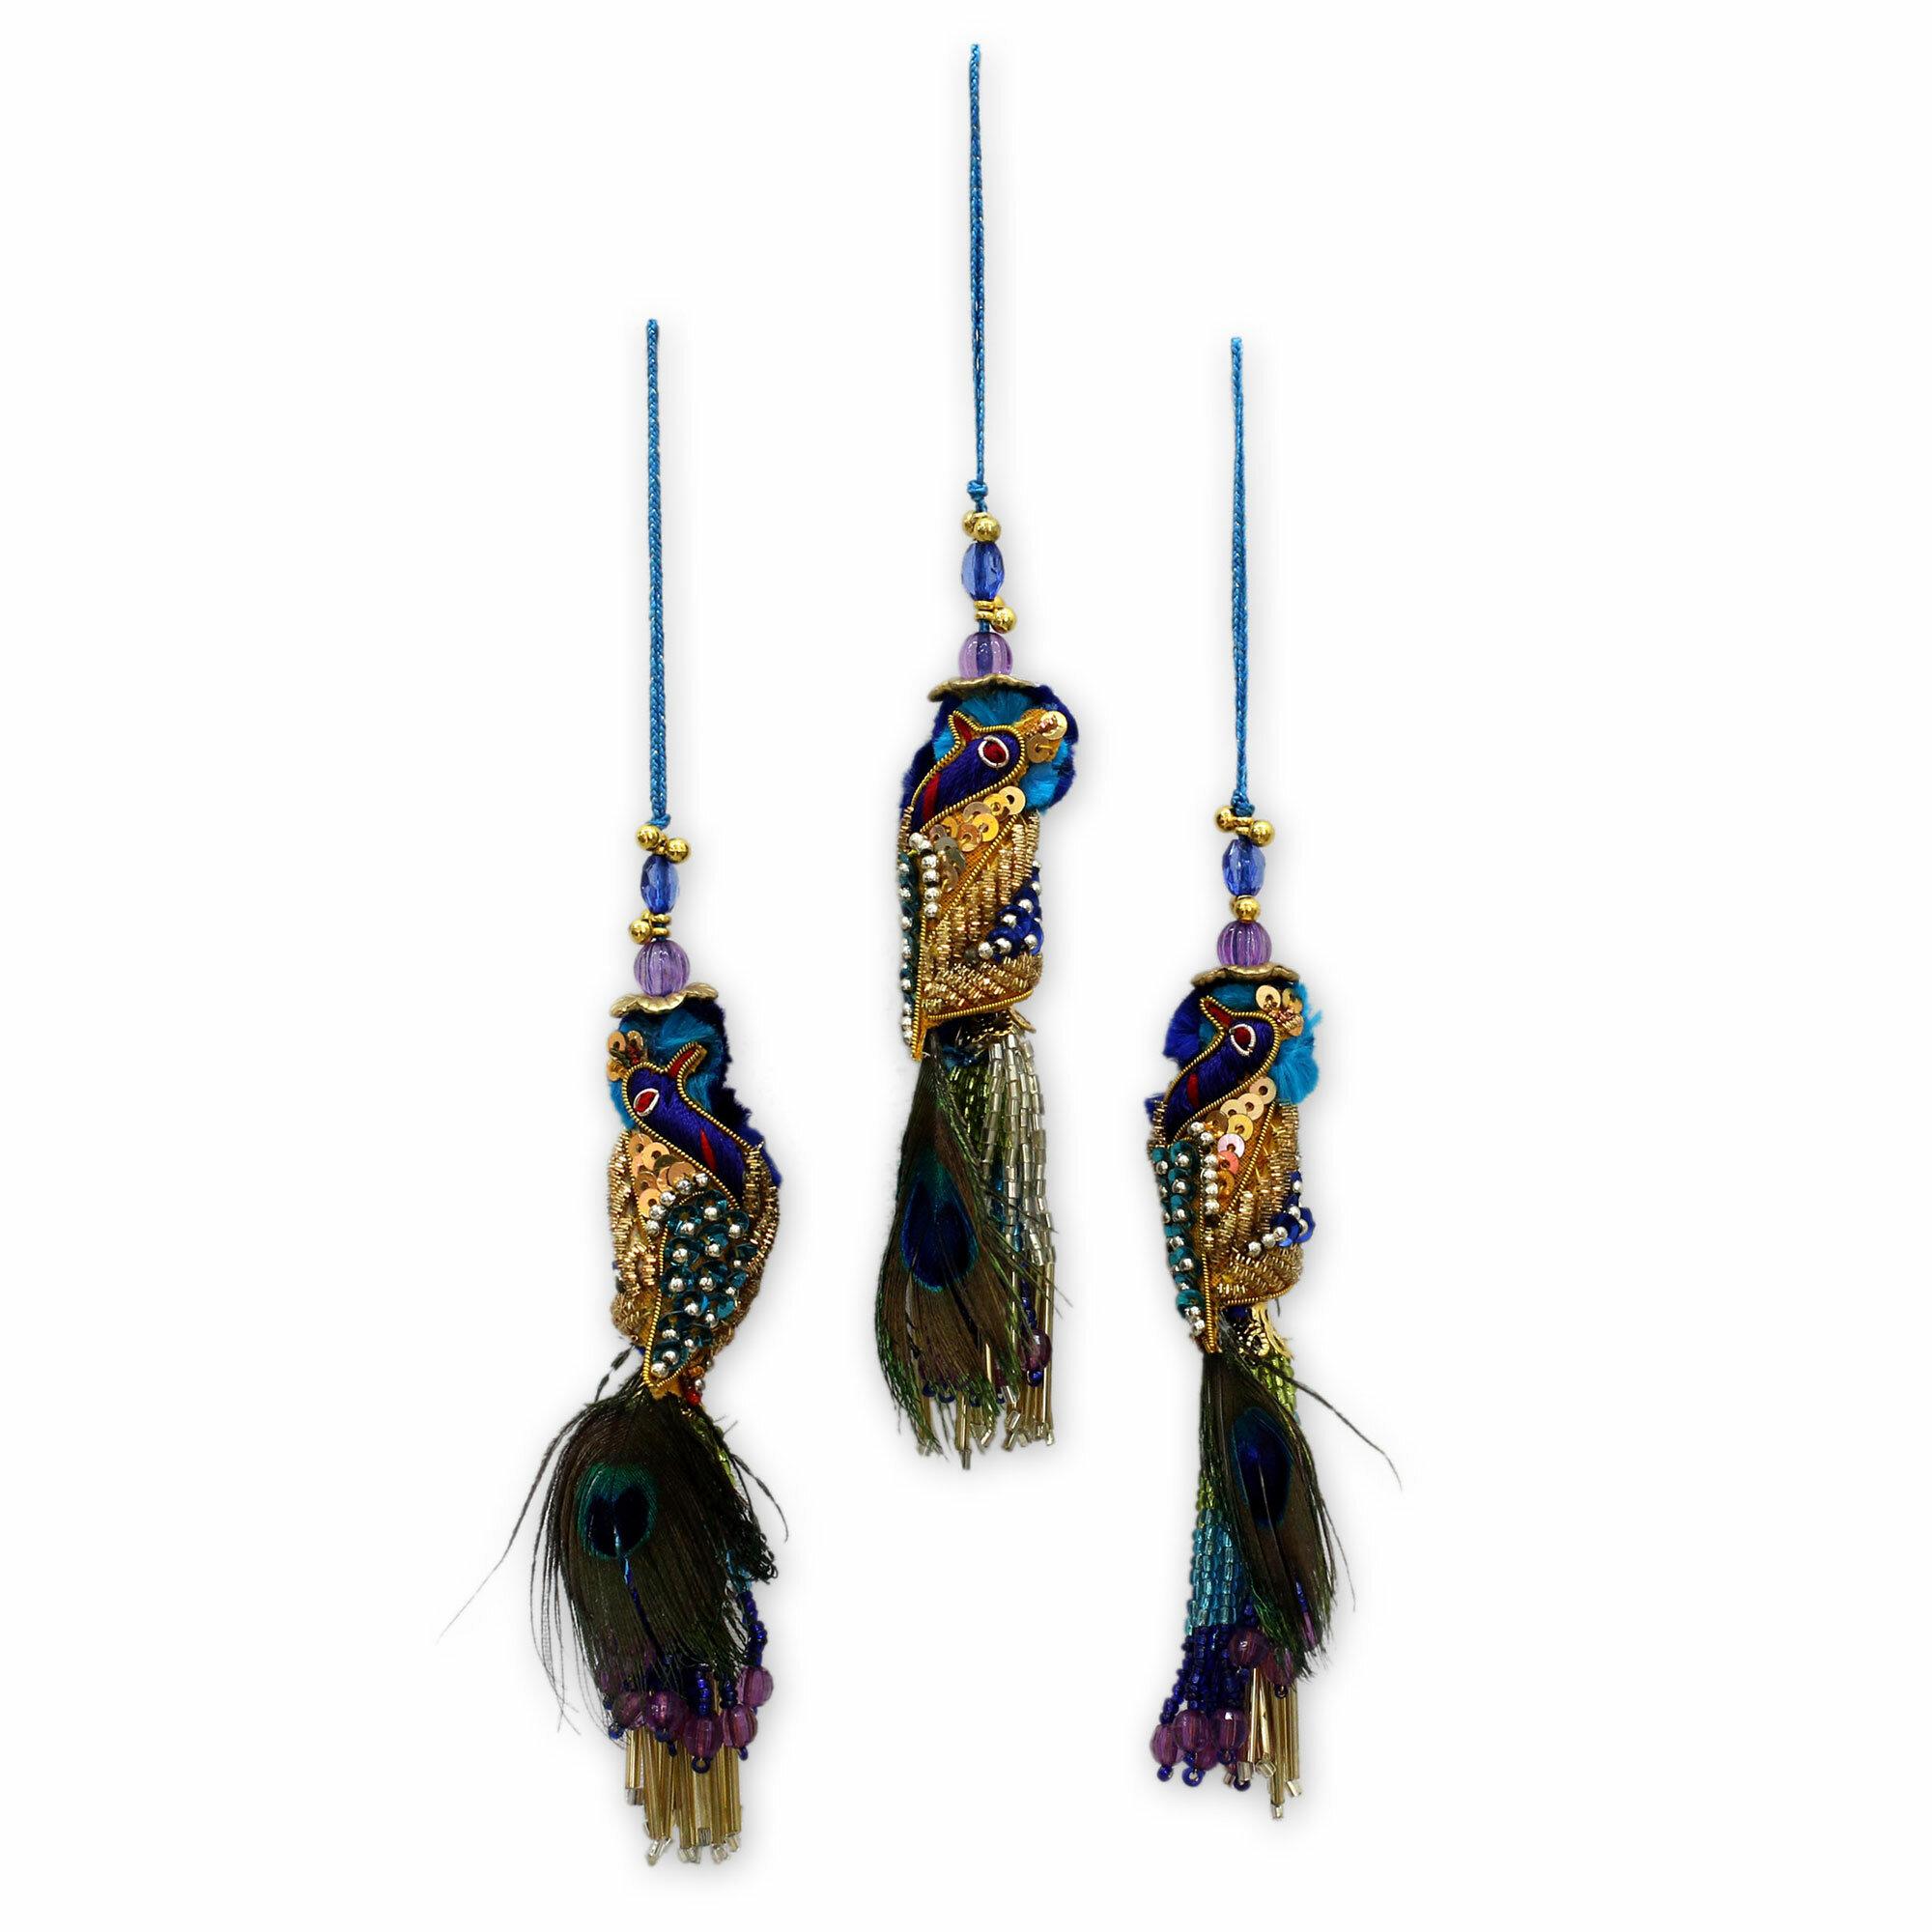 The Holiday Aisle Royal Peacock Beaded Hanging Figurine Ornament Set Of 3 Wayfair